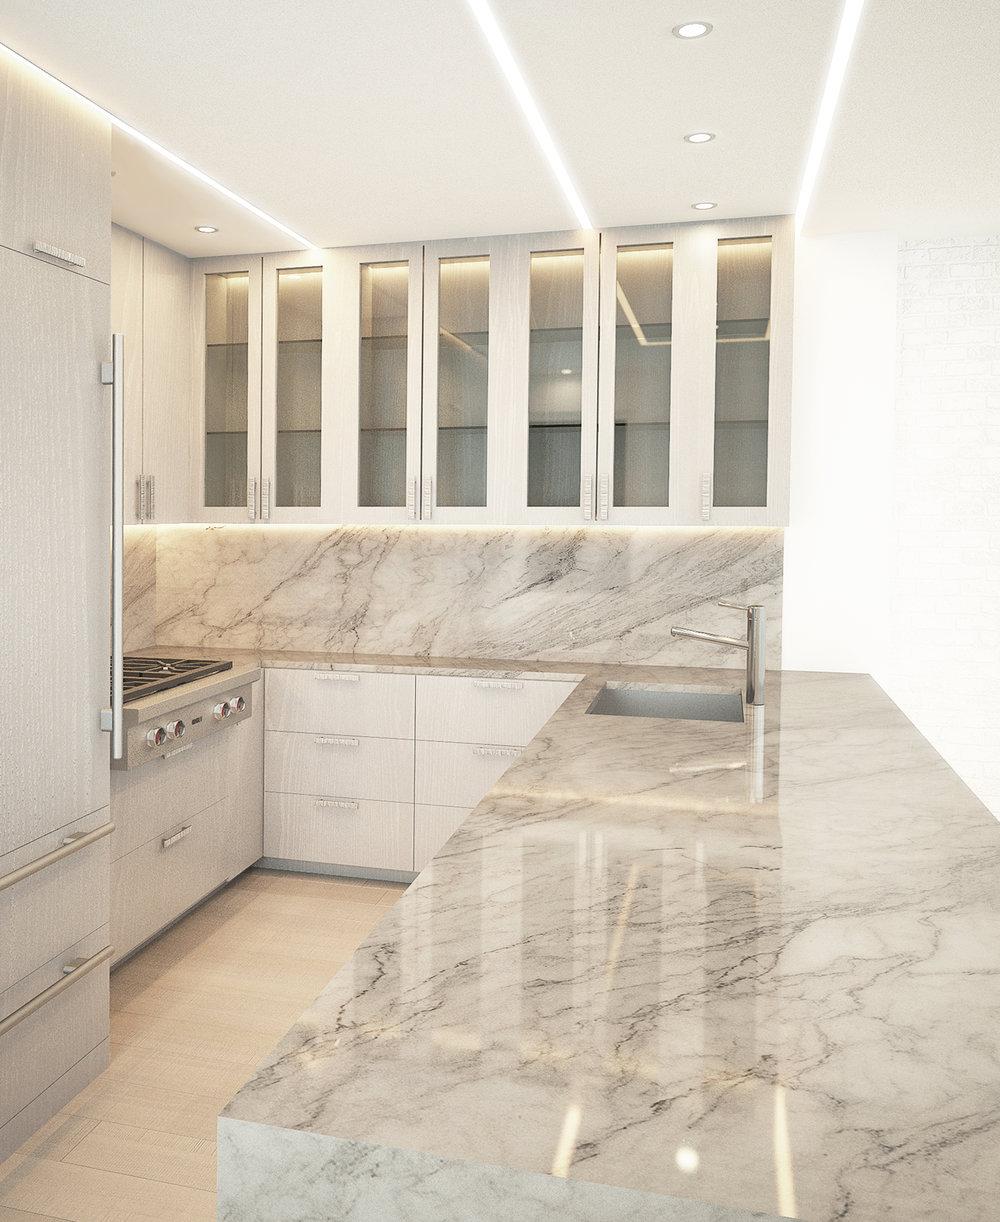 229Westbroadway_kitchen_scene1 (4).jpg